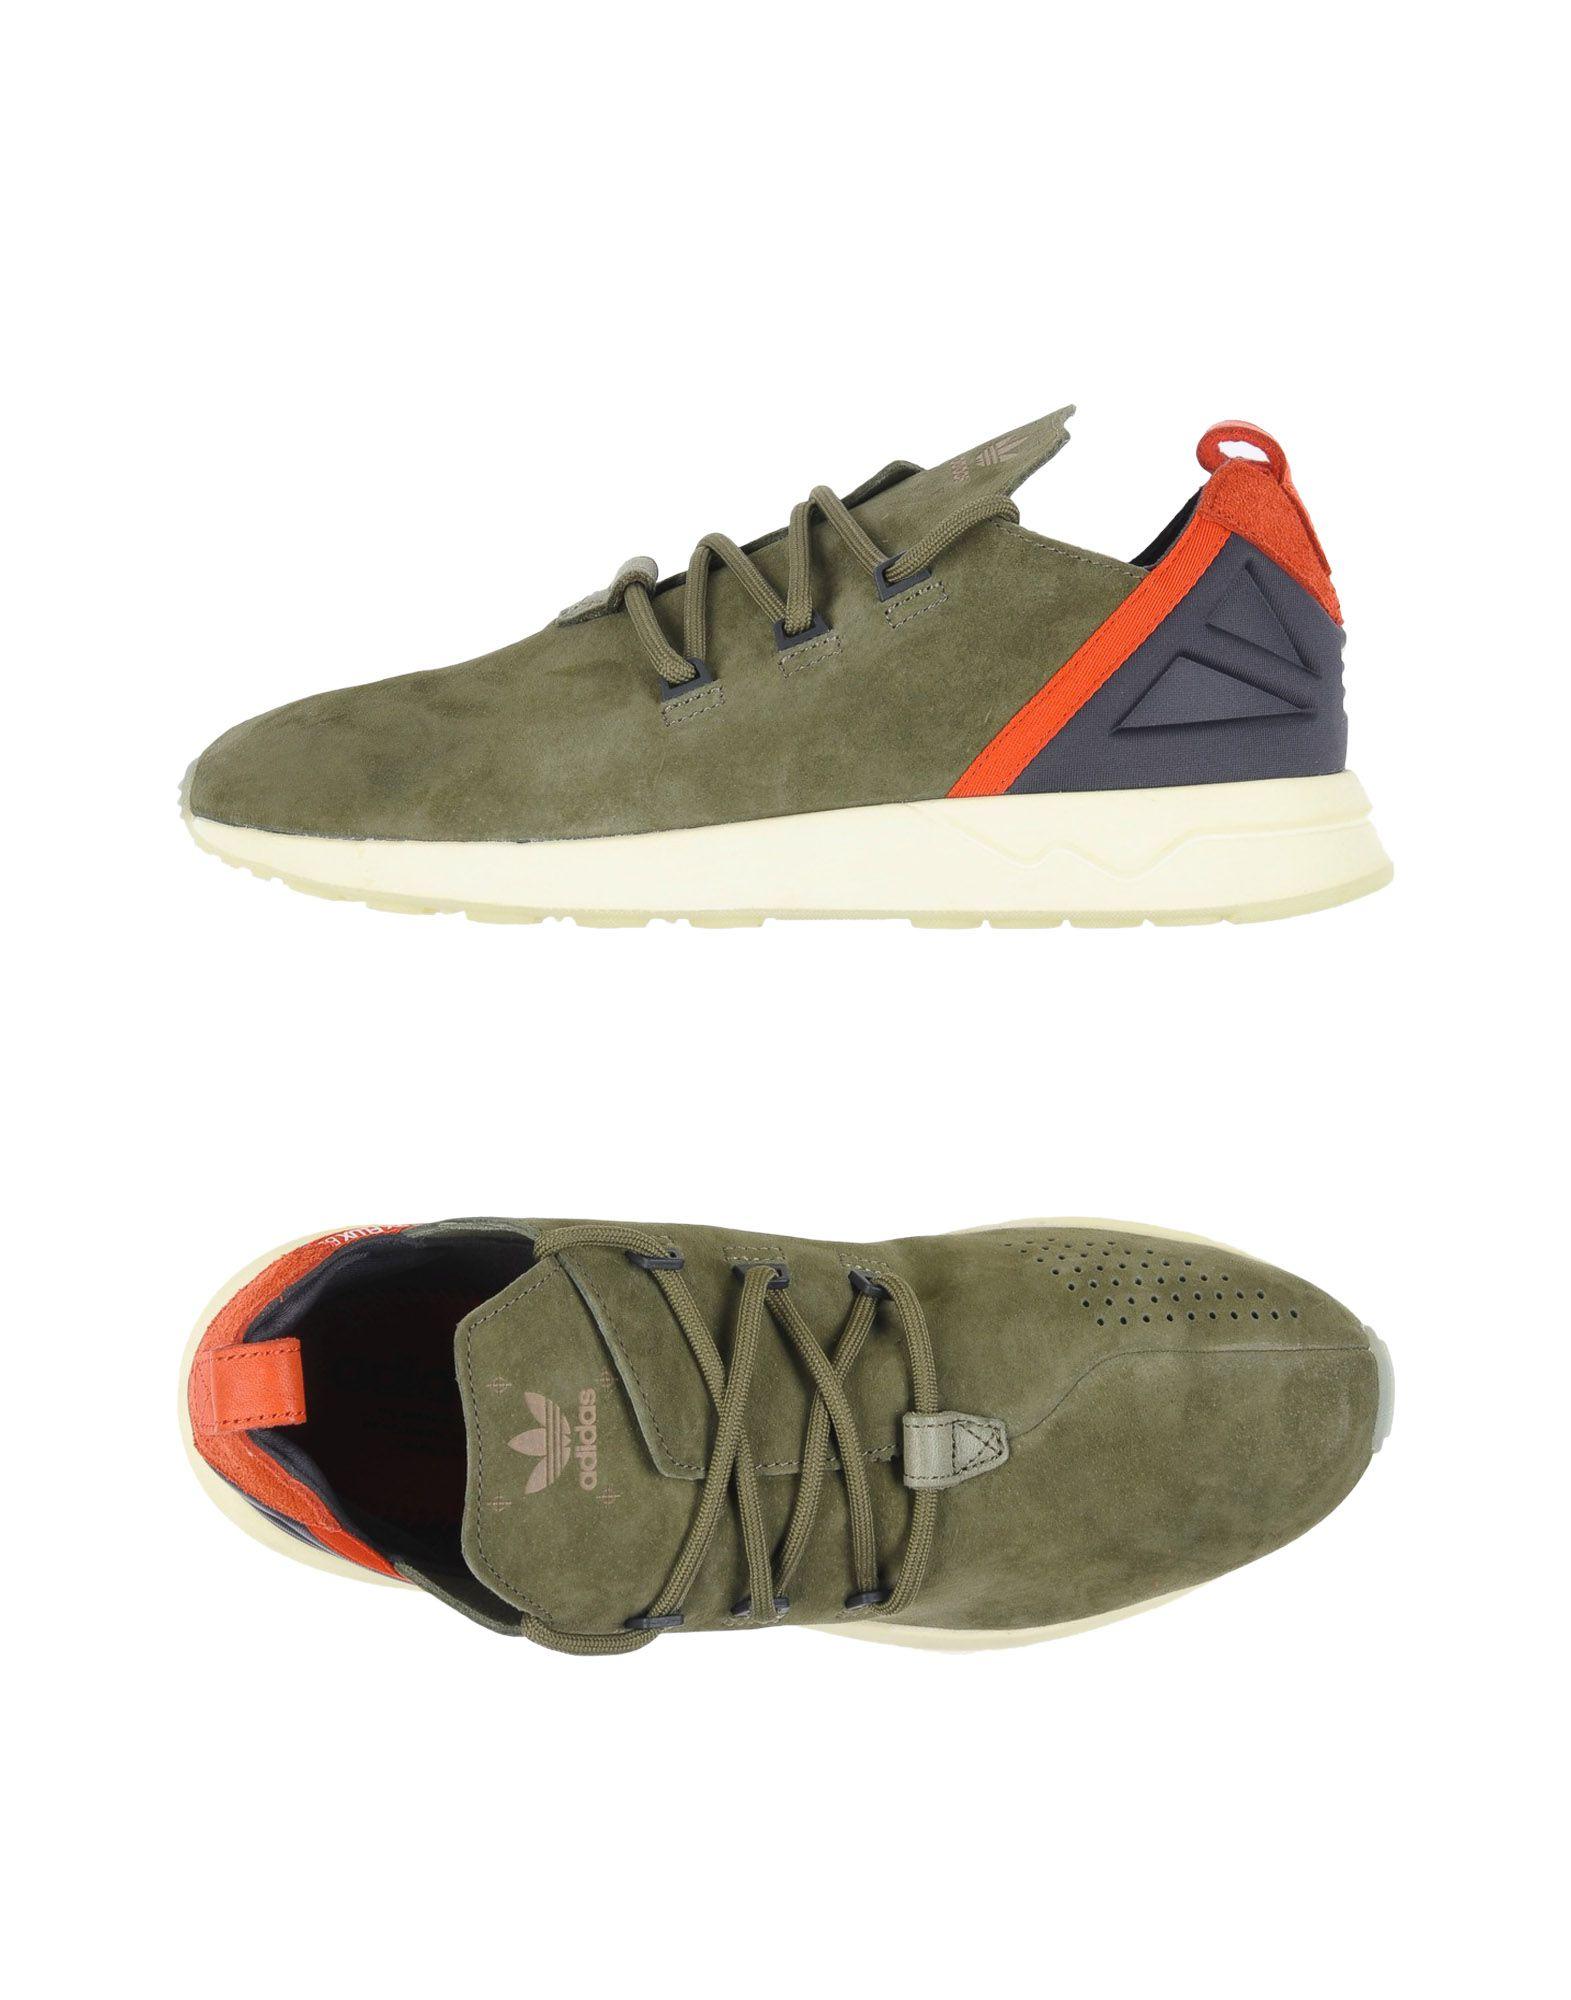 ADIDAS ORIGINALS Herren Low Sneakers & Tennisschuhe6 grün